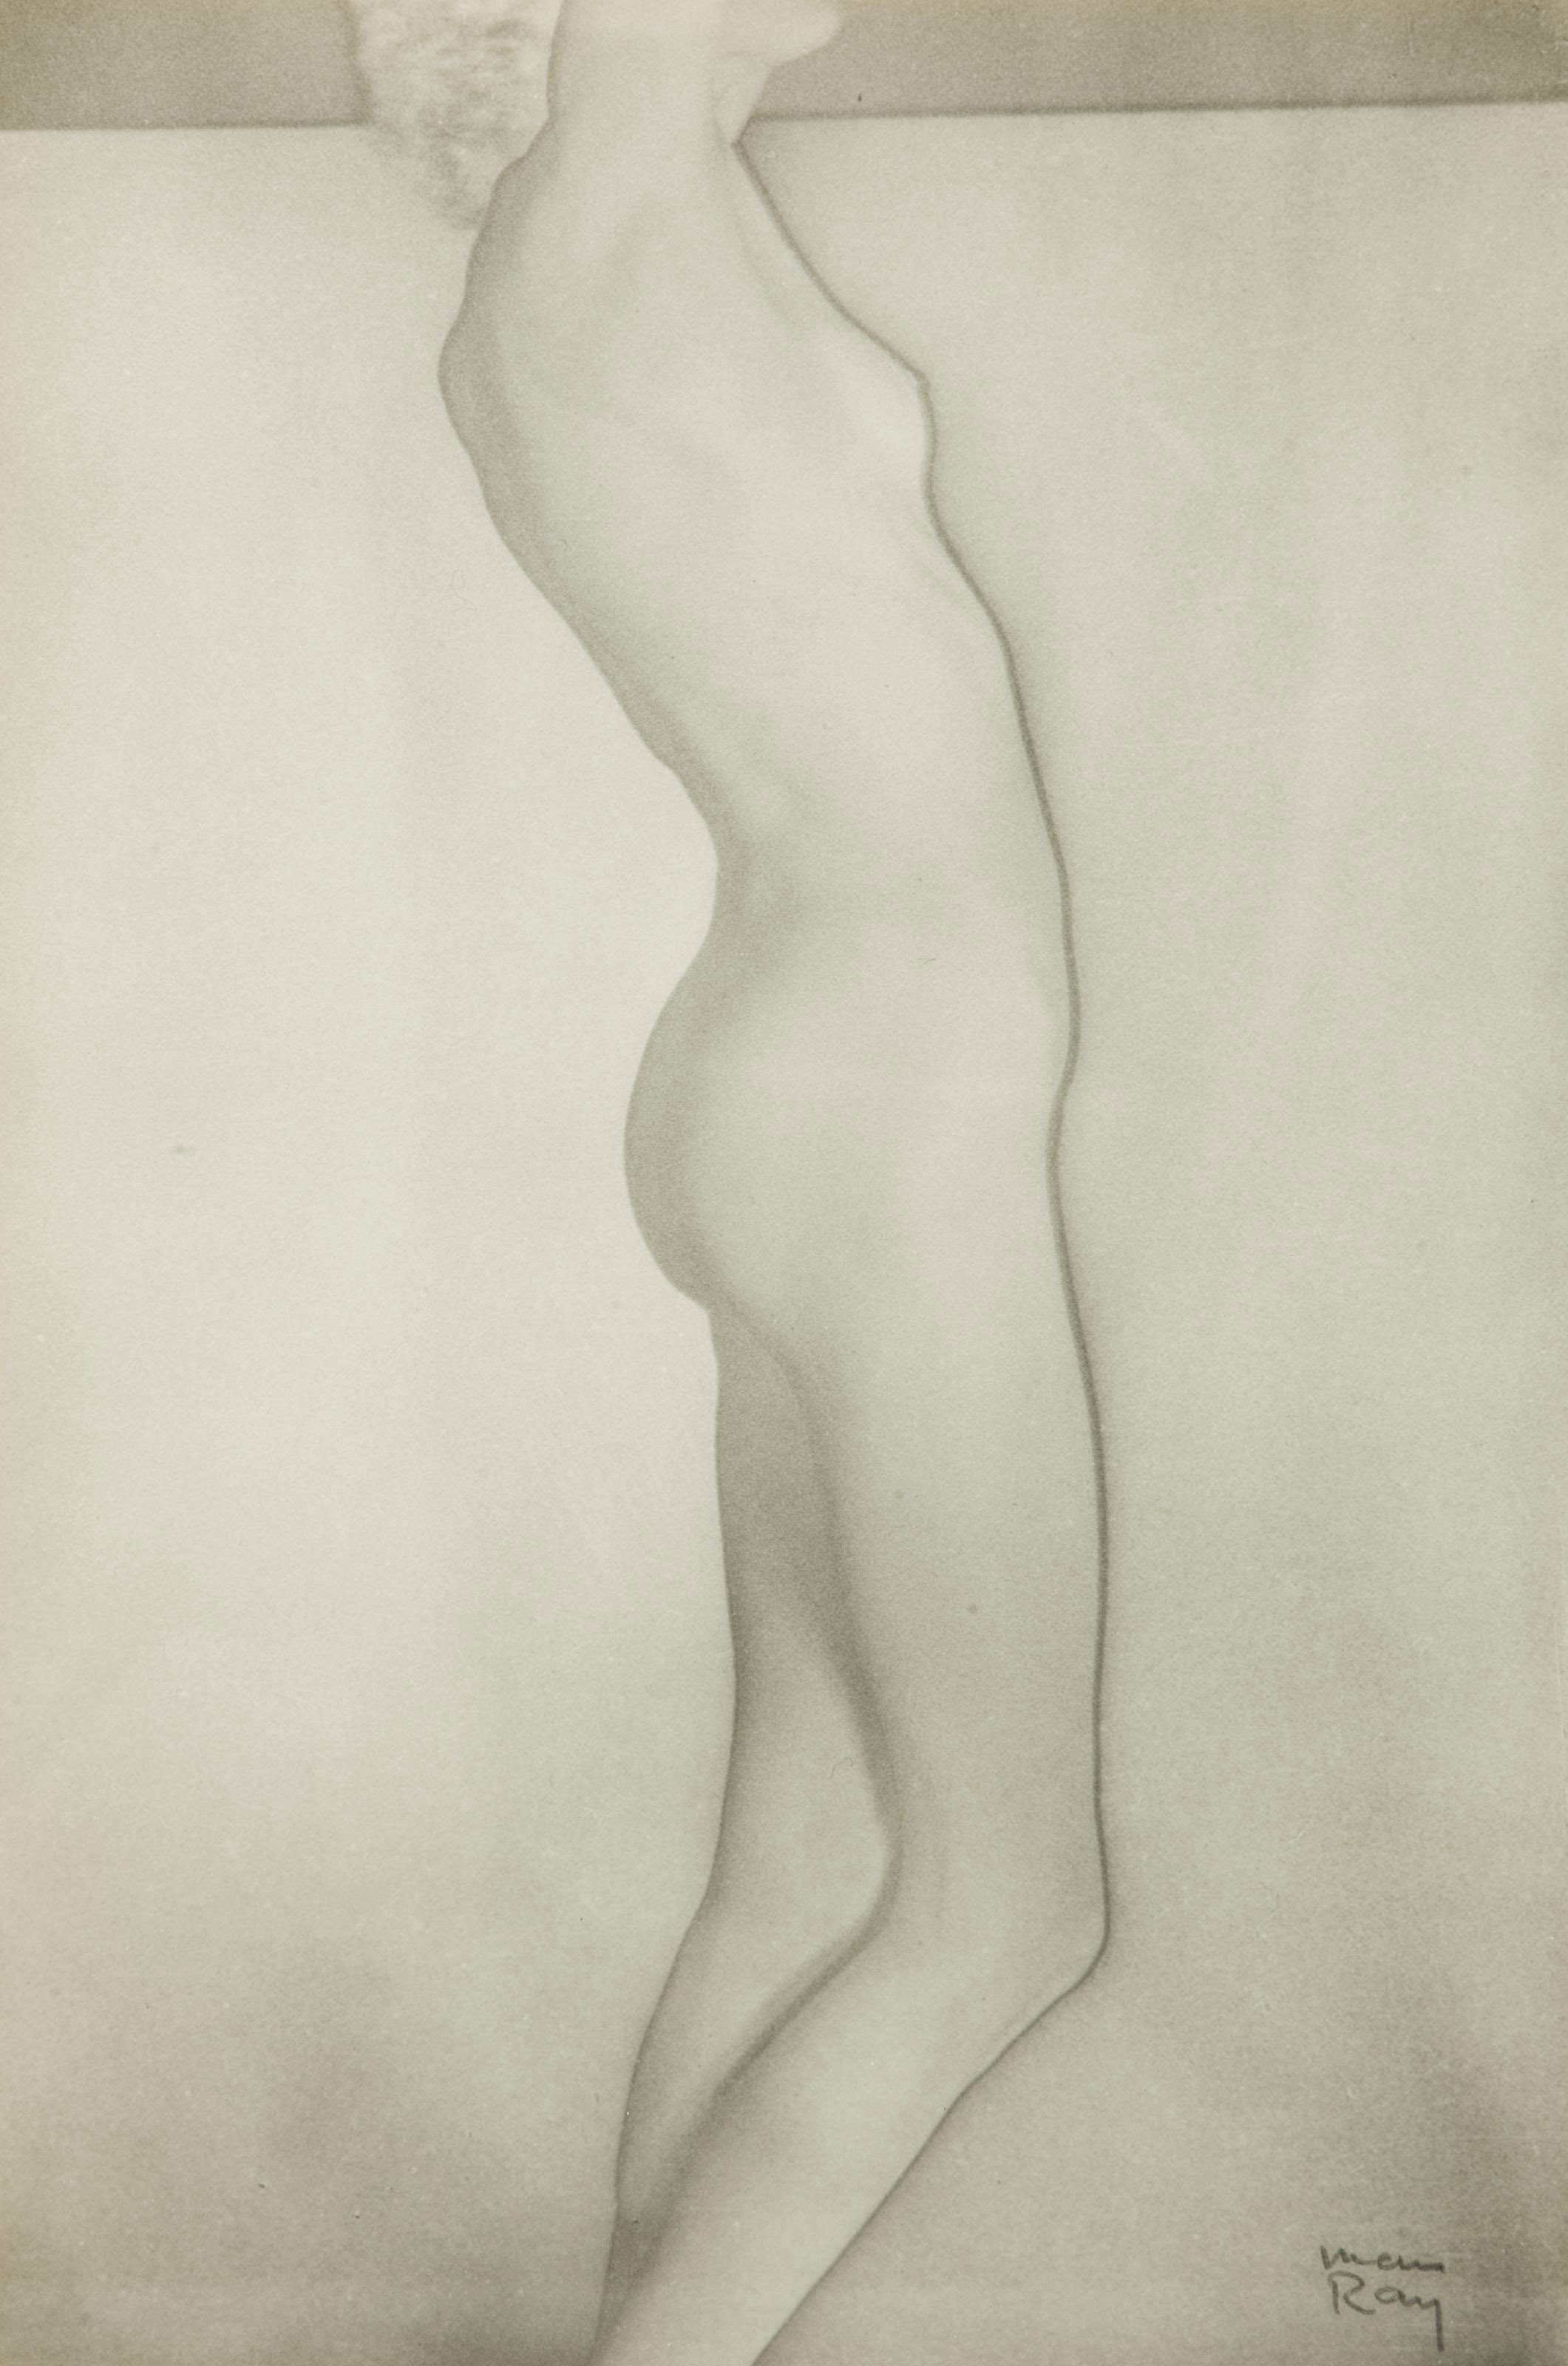 [MAN RAY] -- ÉLUARD, Paul (1895-1952). Facile. Poèmes de Paul Éluard, photographies de Man Ray. Paris: GLM, 1935.